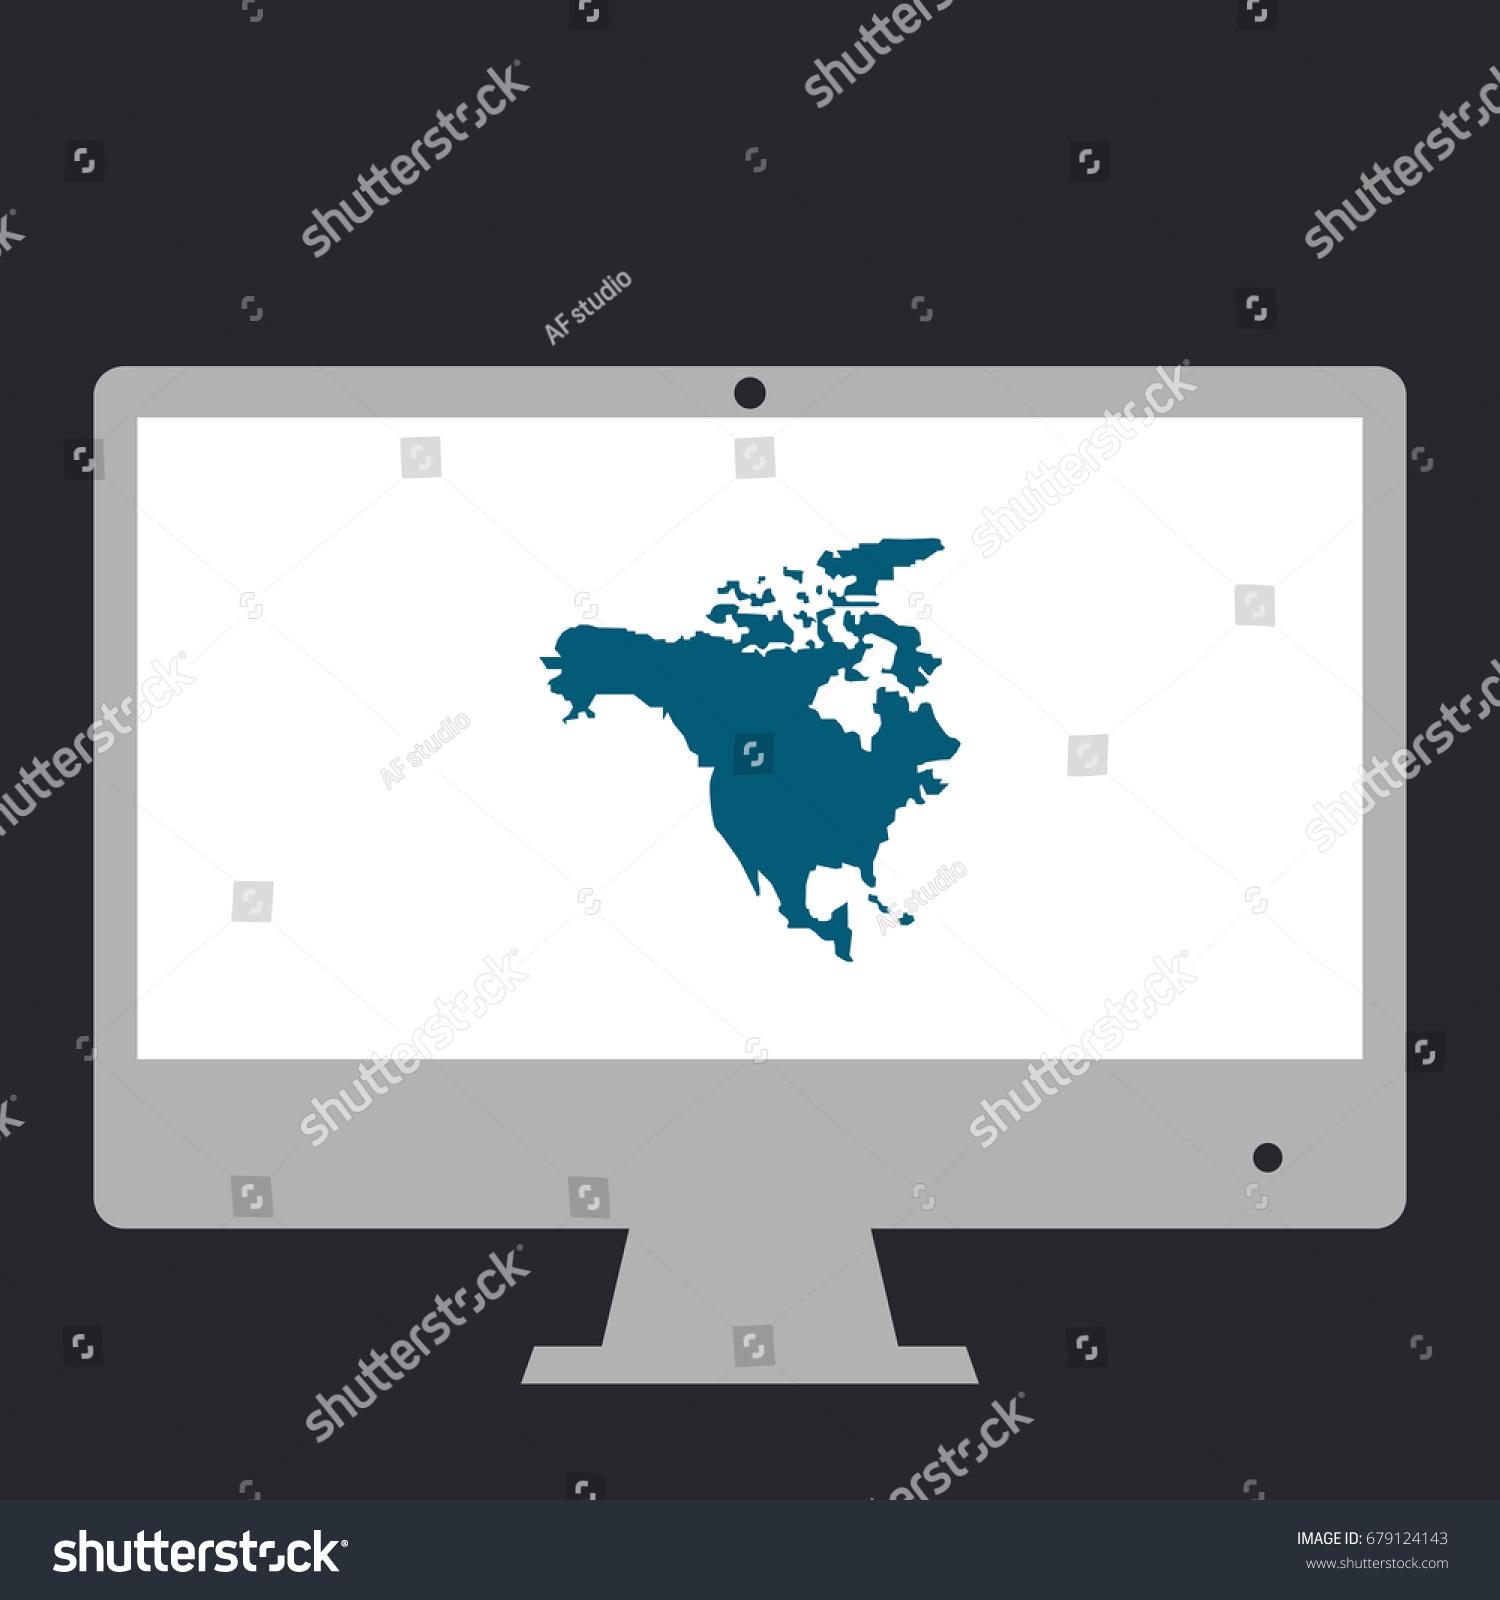 North america map simple flat symbol stock vector 679124143 north america map simple flat symbol icon on monitor vector illustration pictogram sciox Gallery